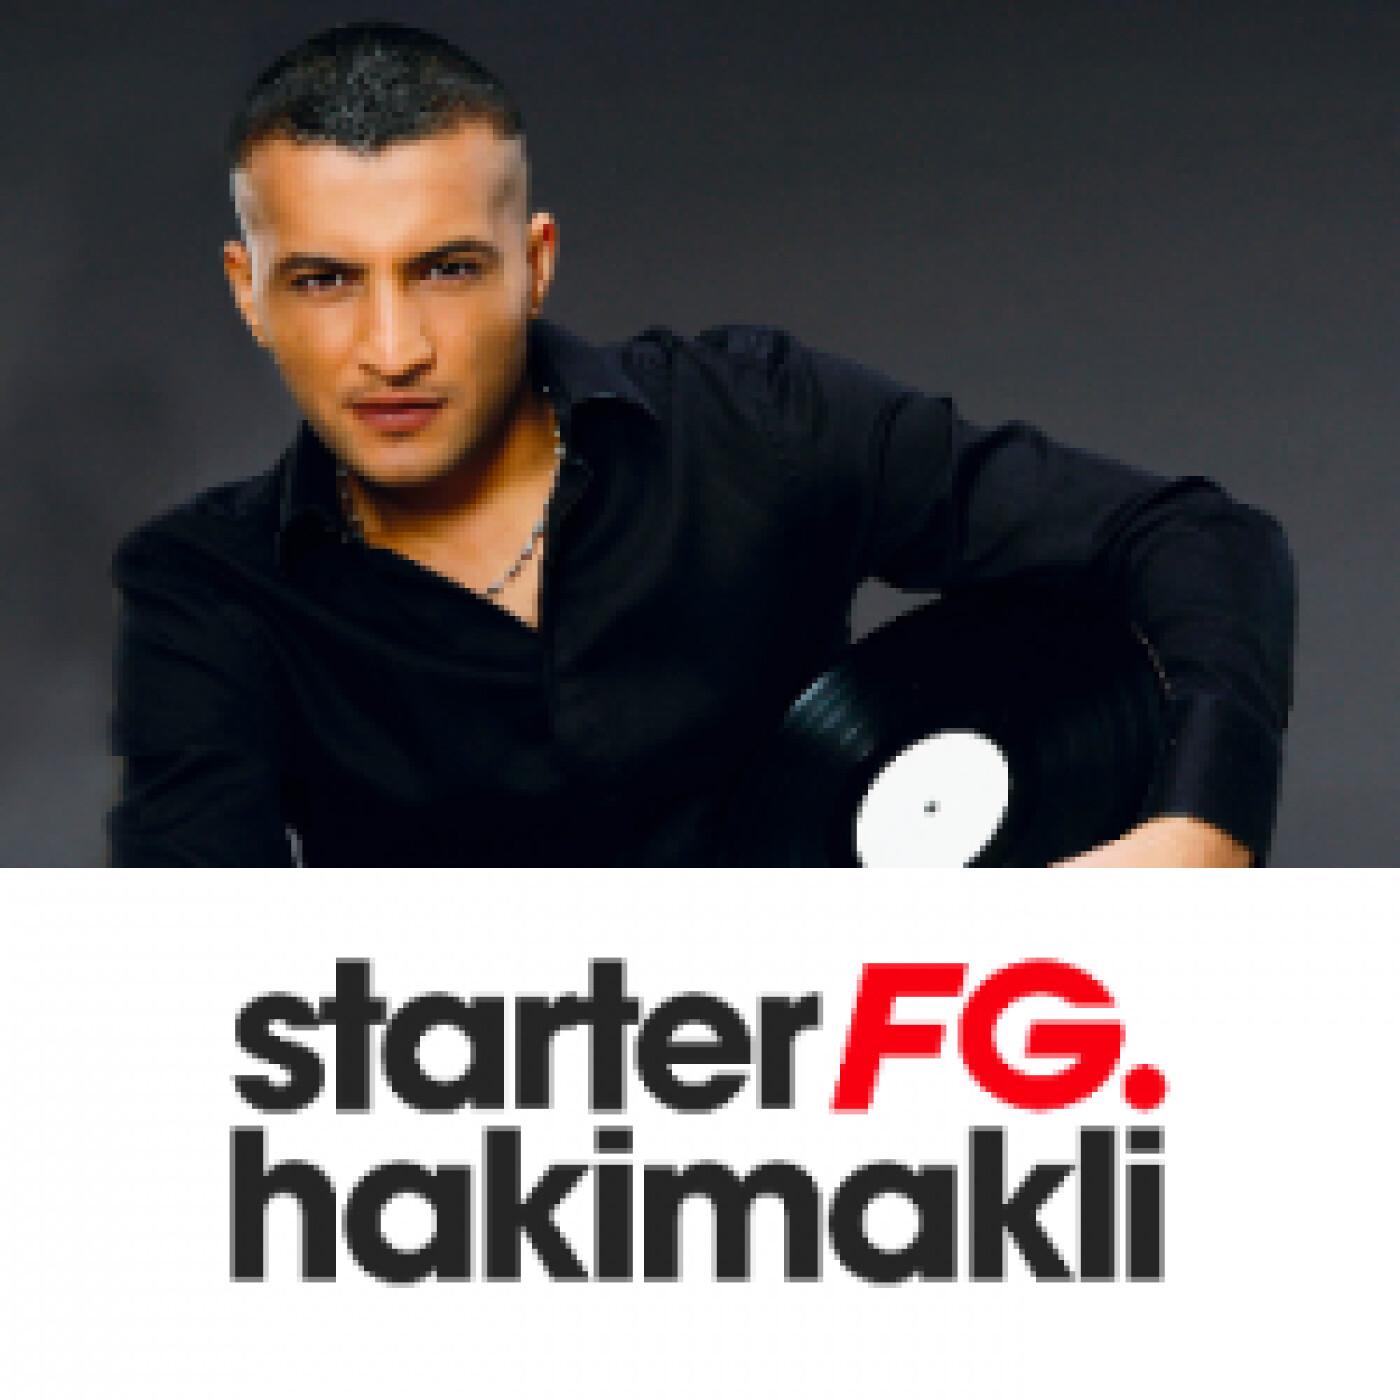 STARTER FG BY HAKIMAKLI JEUDI 18 MARS 2021